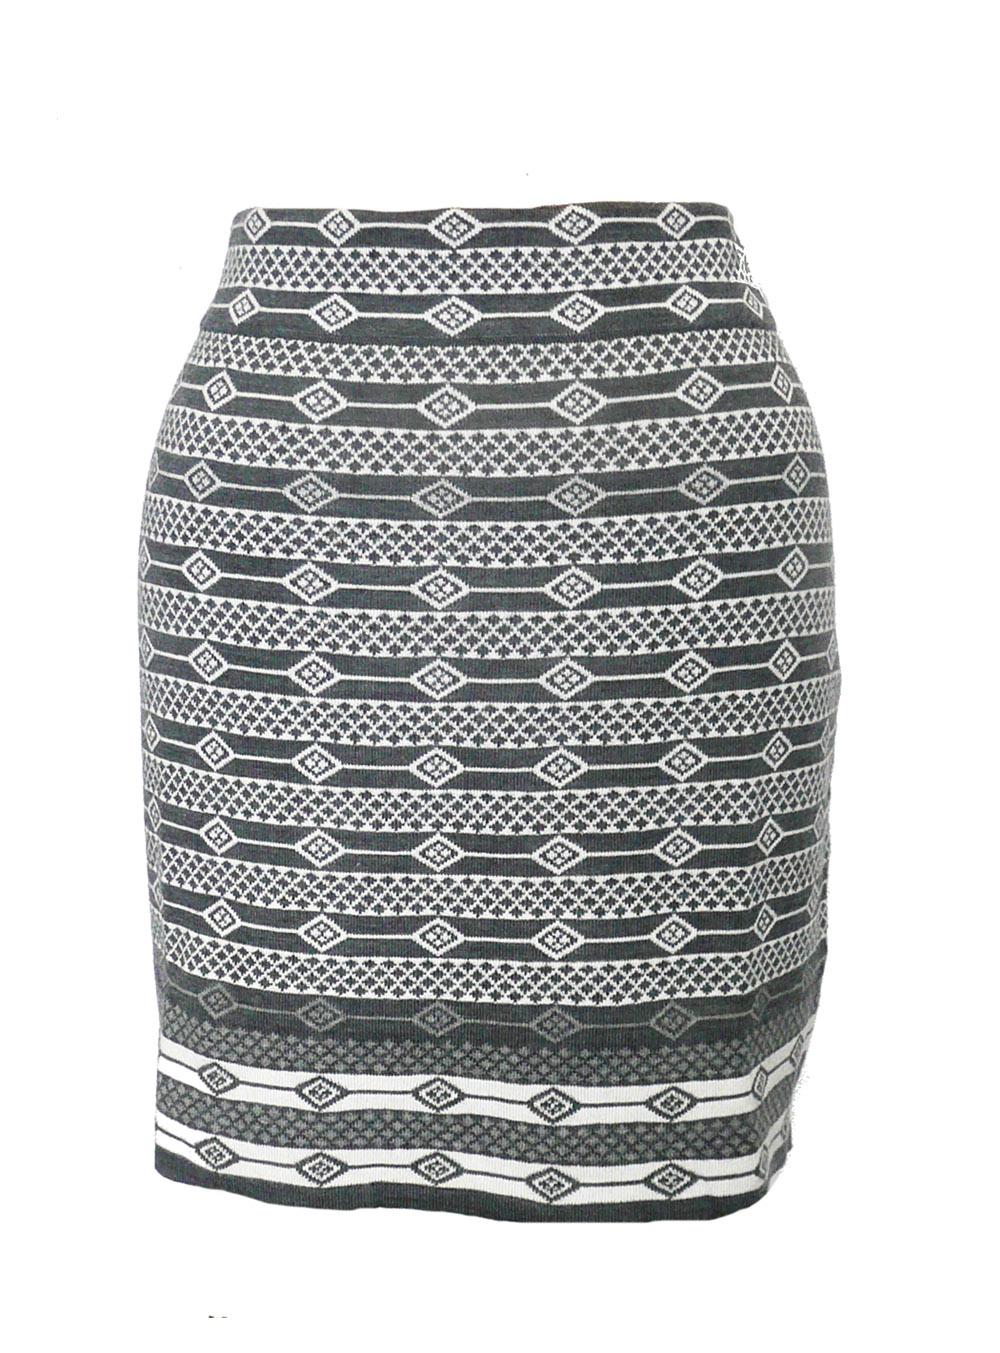 skt krimson grey pattern knit.jpg